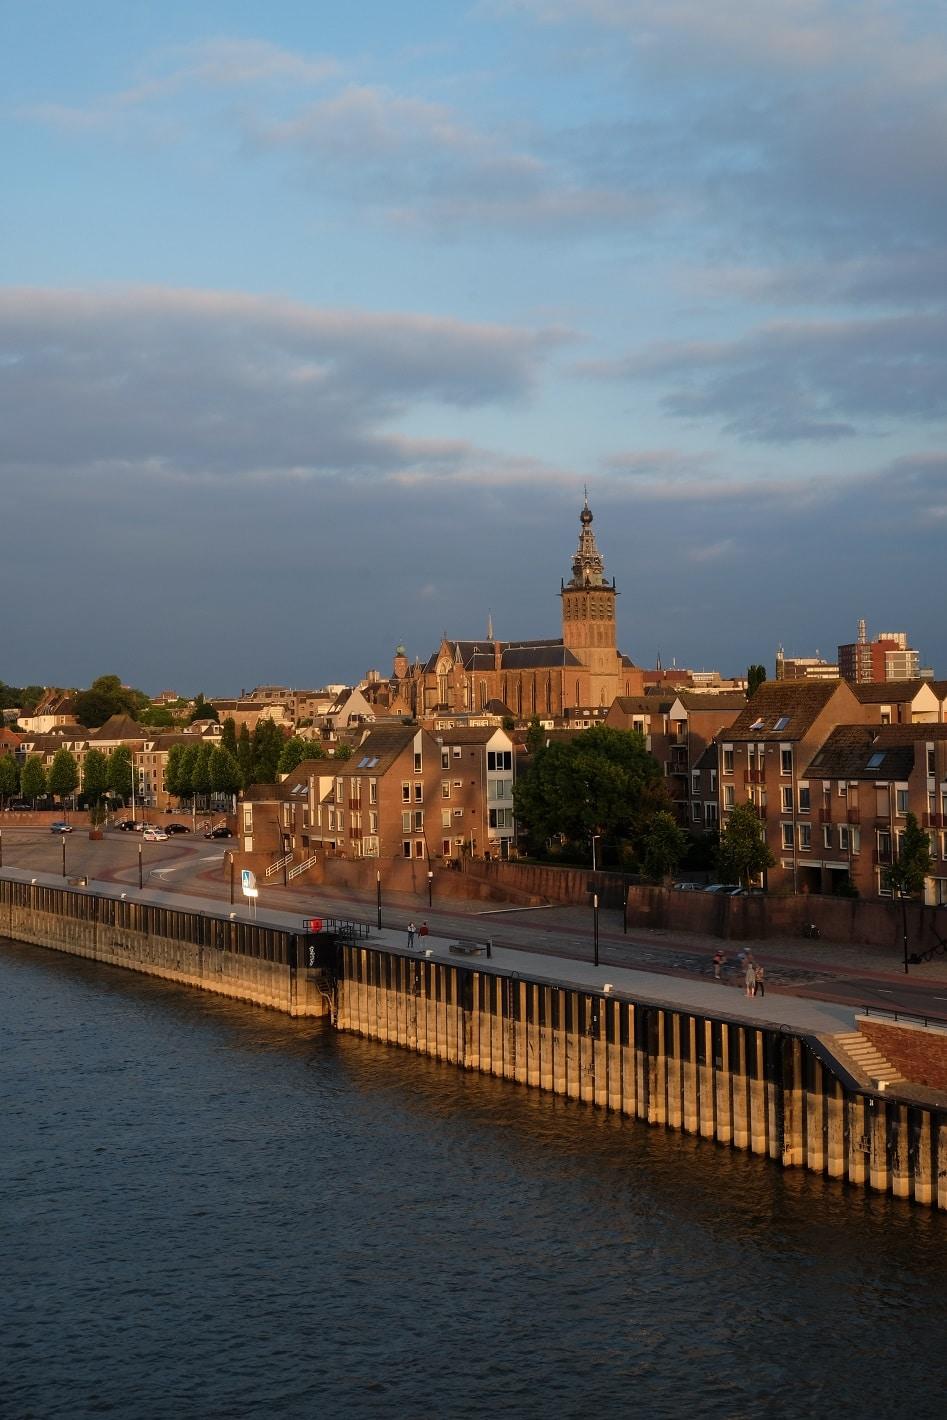 Nijmegen 17-06-2017